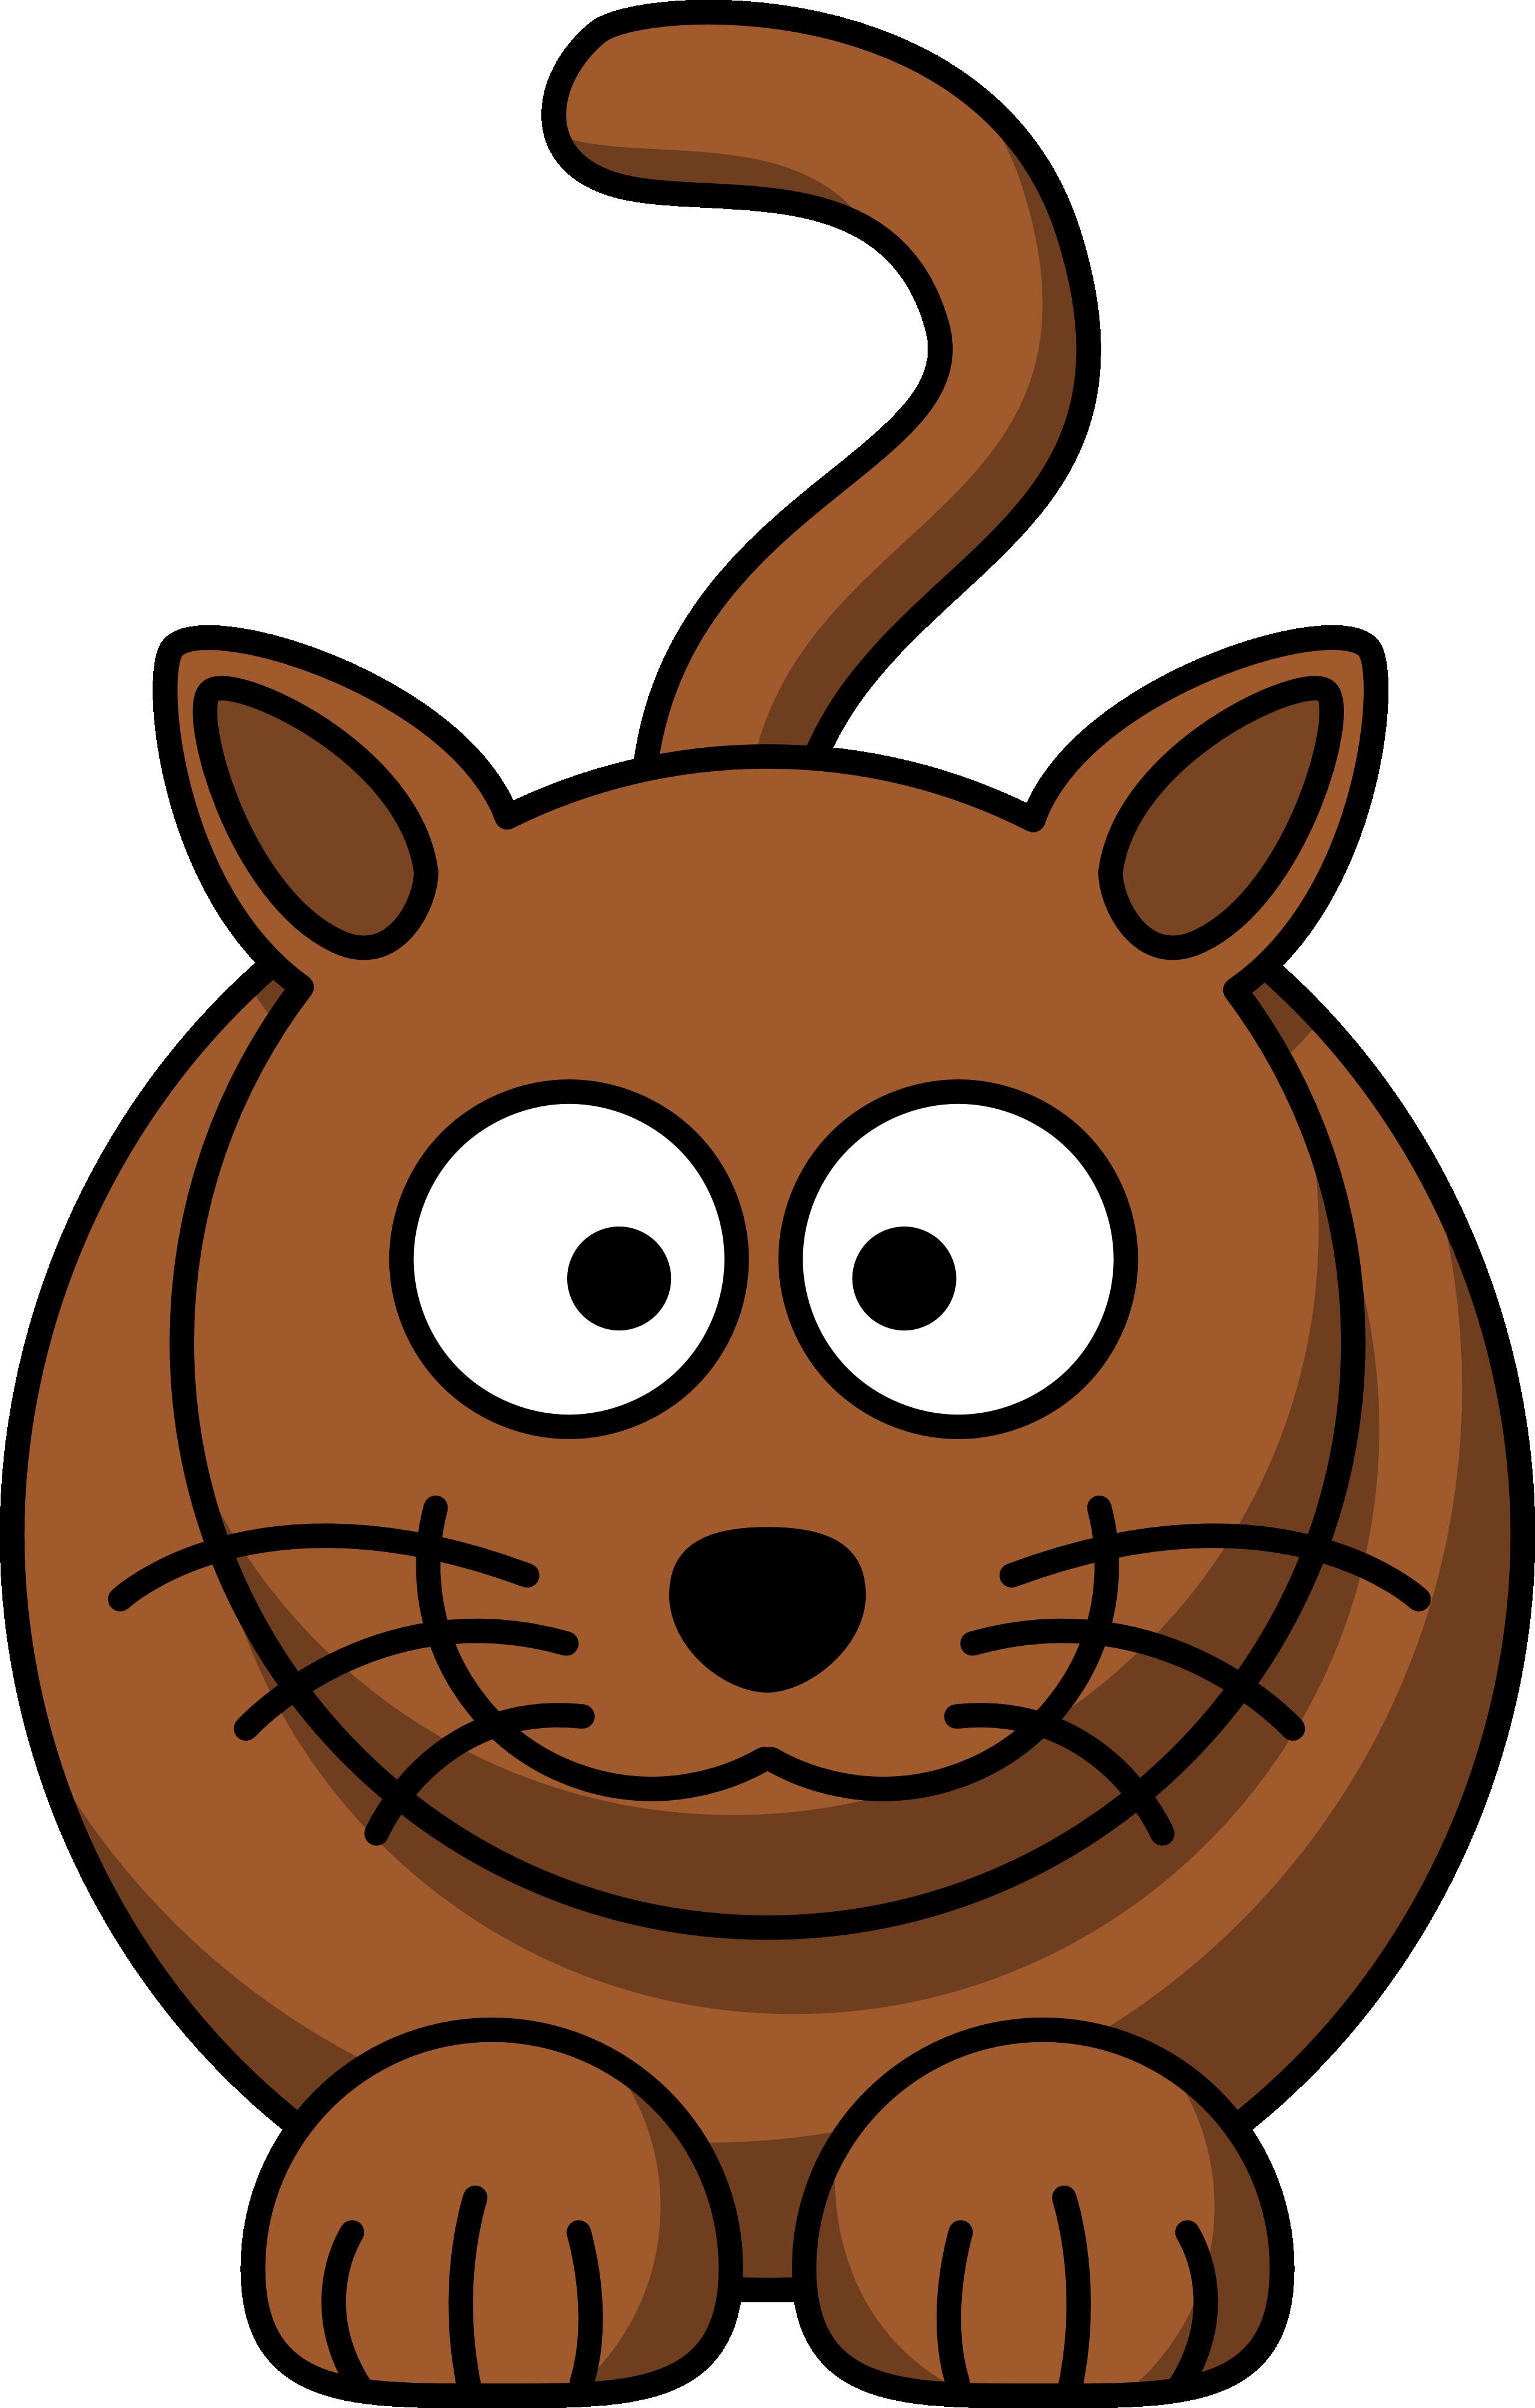 2555x4009 Xmas Stuff For Gt Christmas Cartoon Animals Cartoon Animals